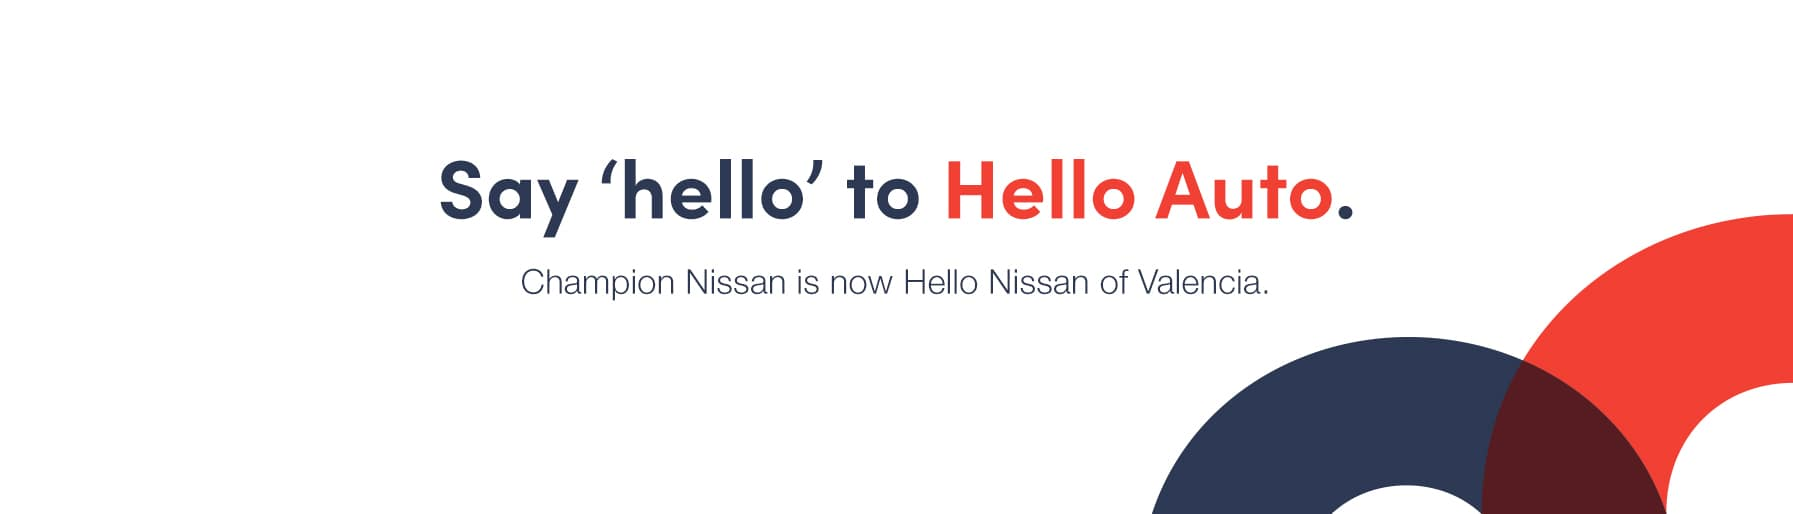 say hello to hello nissan